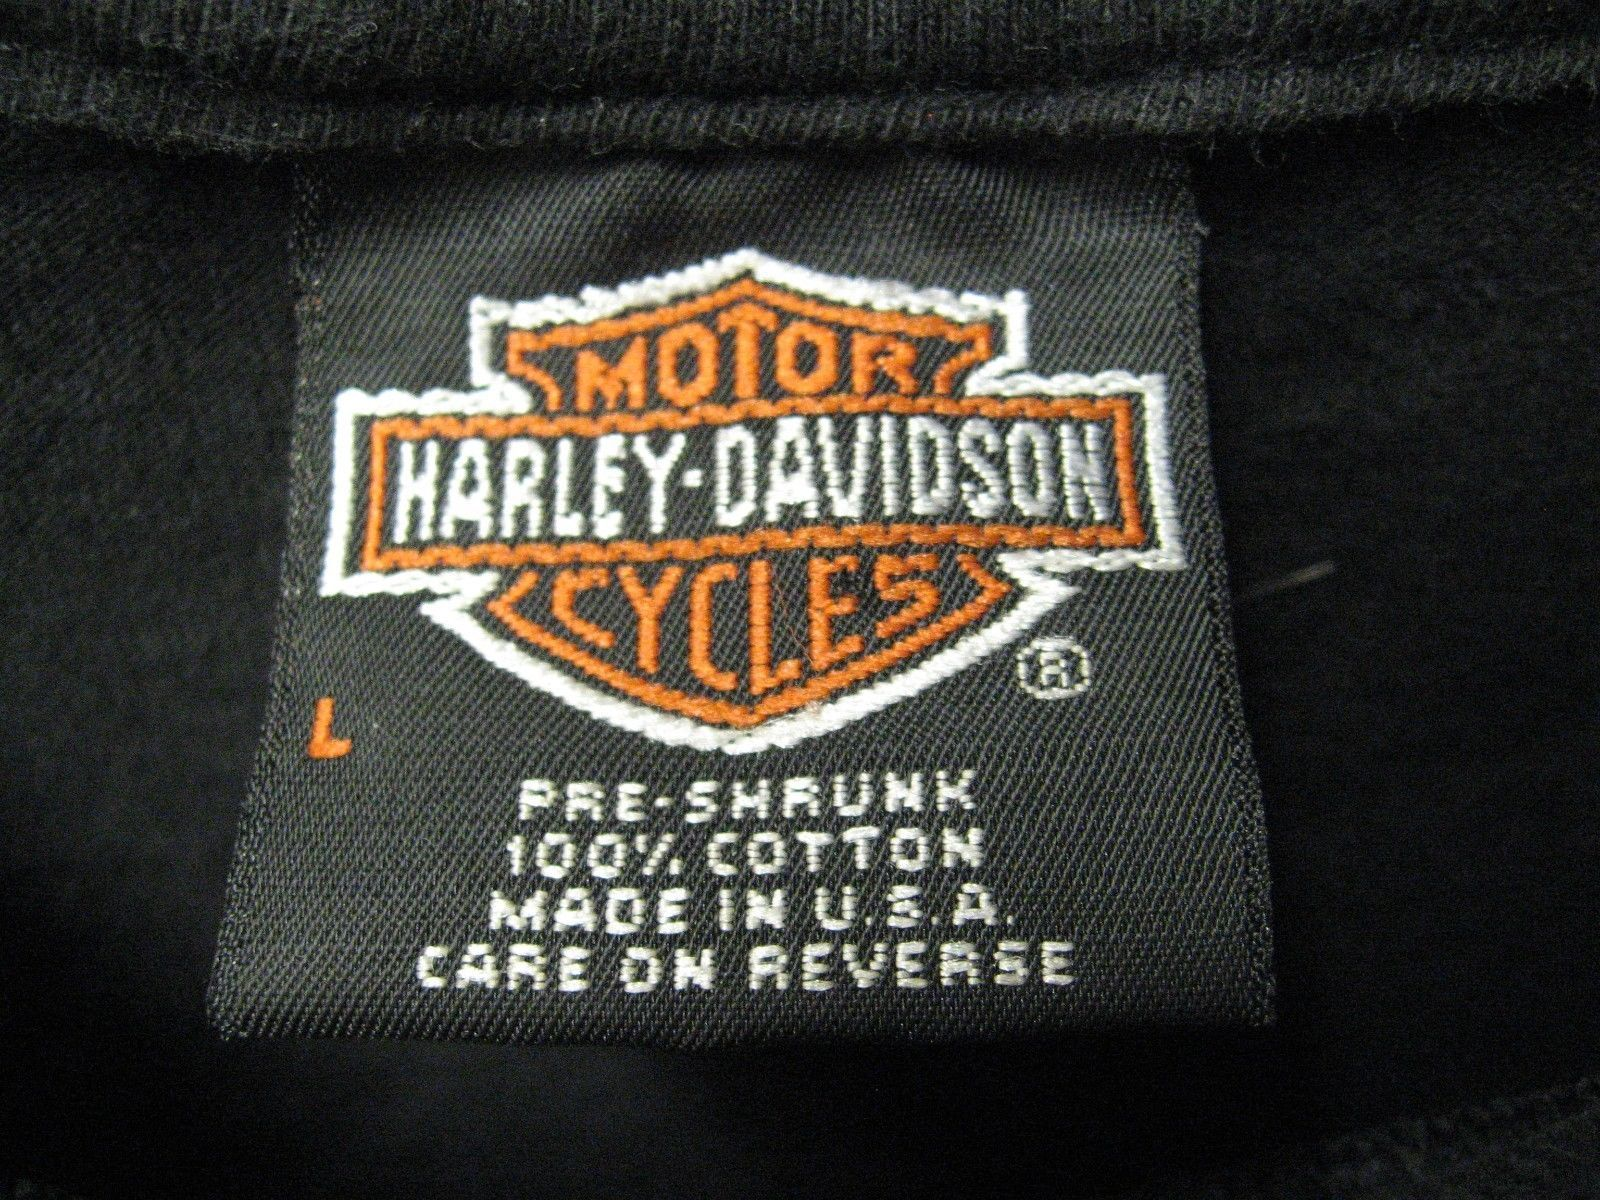 Barnett harley davidson coupon code